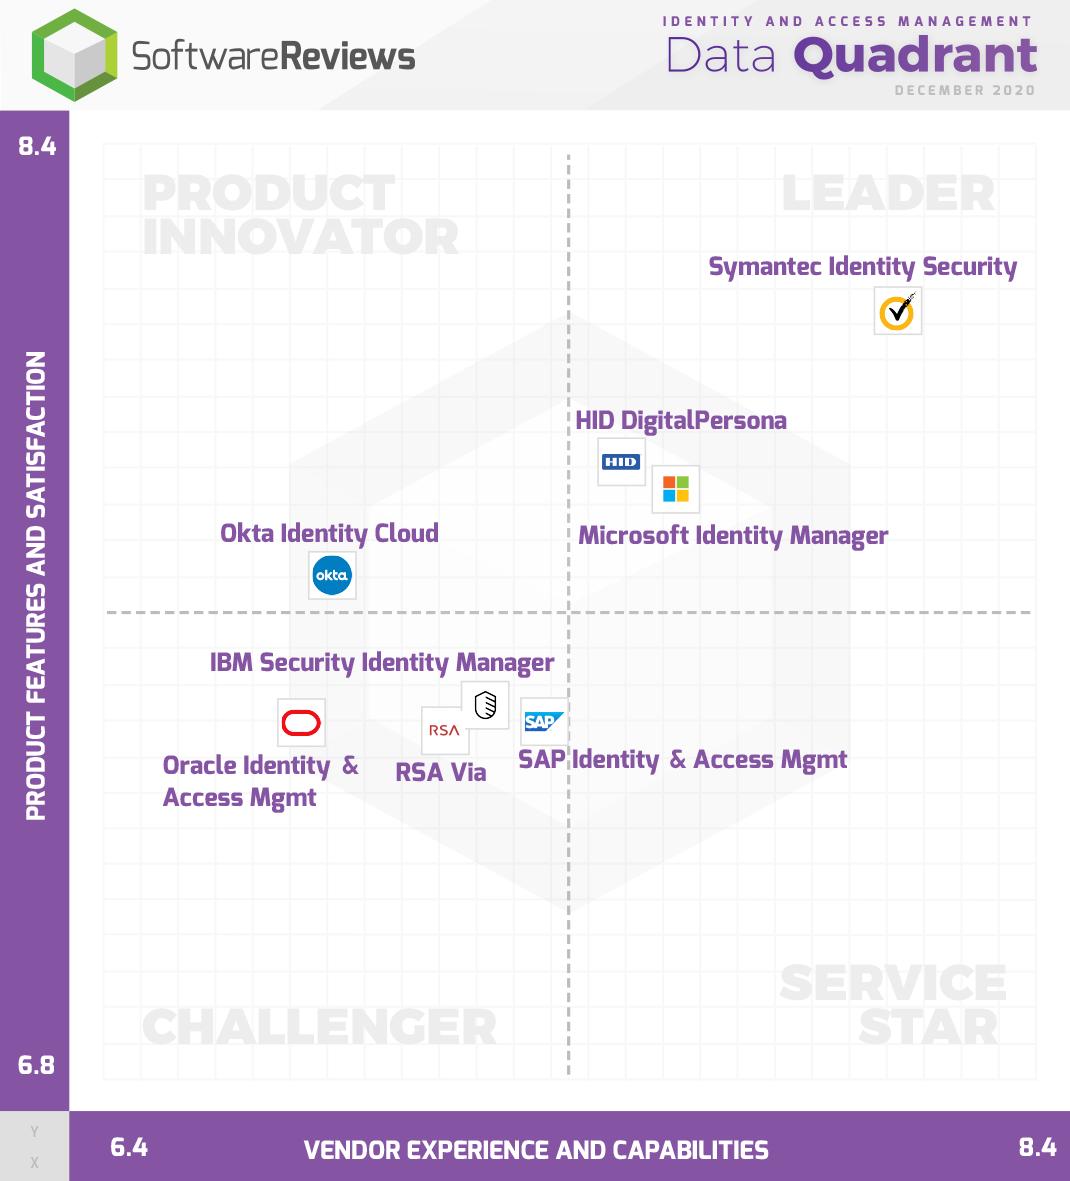 Identity and Access Management Data Quadrant